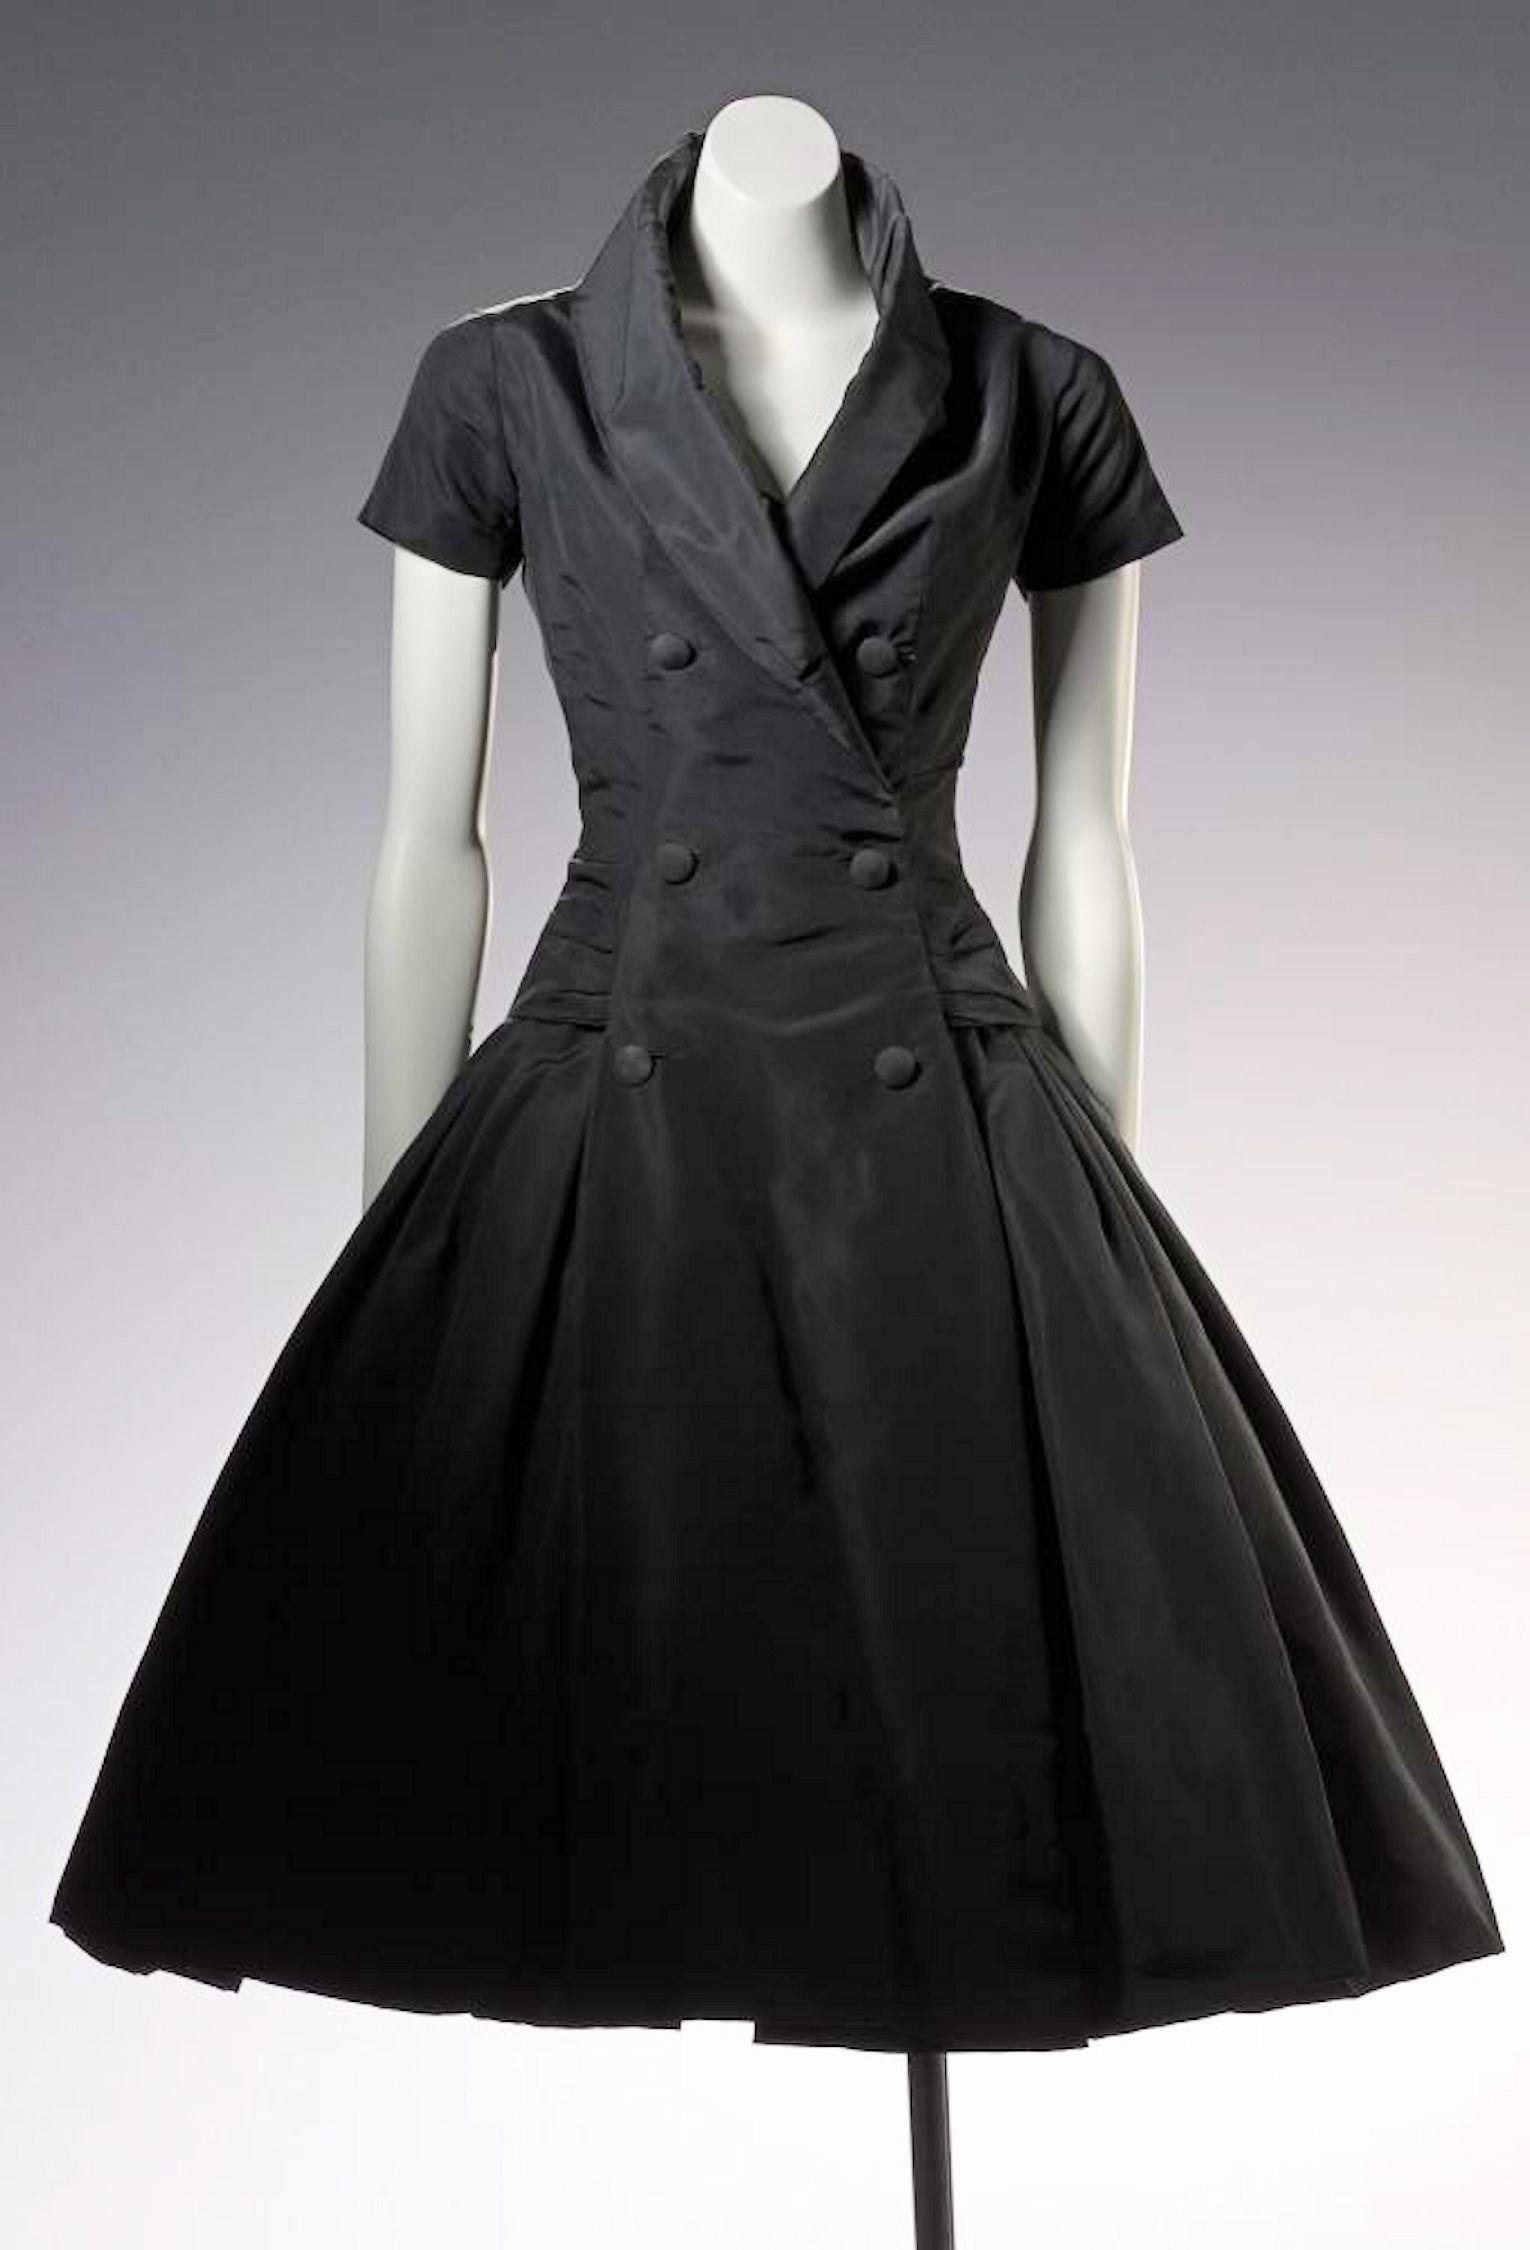 Vintage style cocktail dresses melbourne